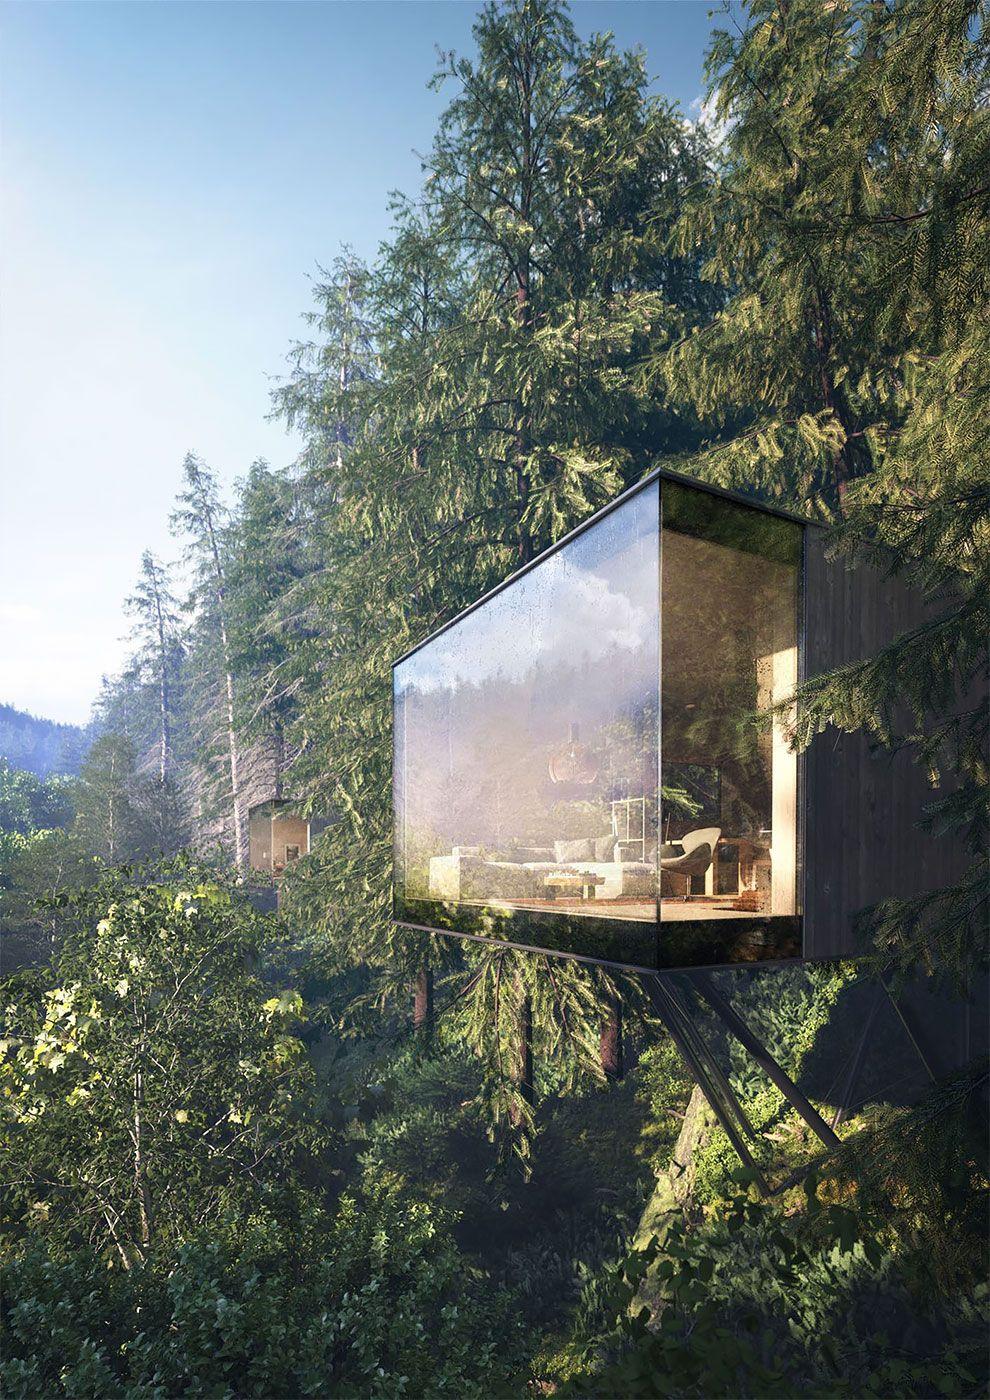 This Cozy Place - Revugia Spa & Wellness Resort Hotel By Lichtecht